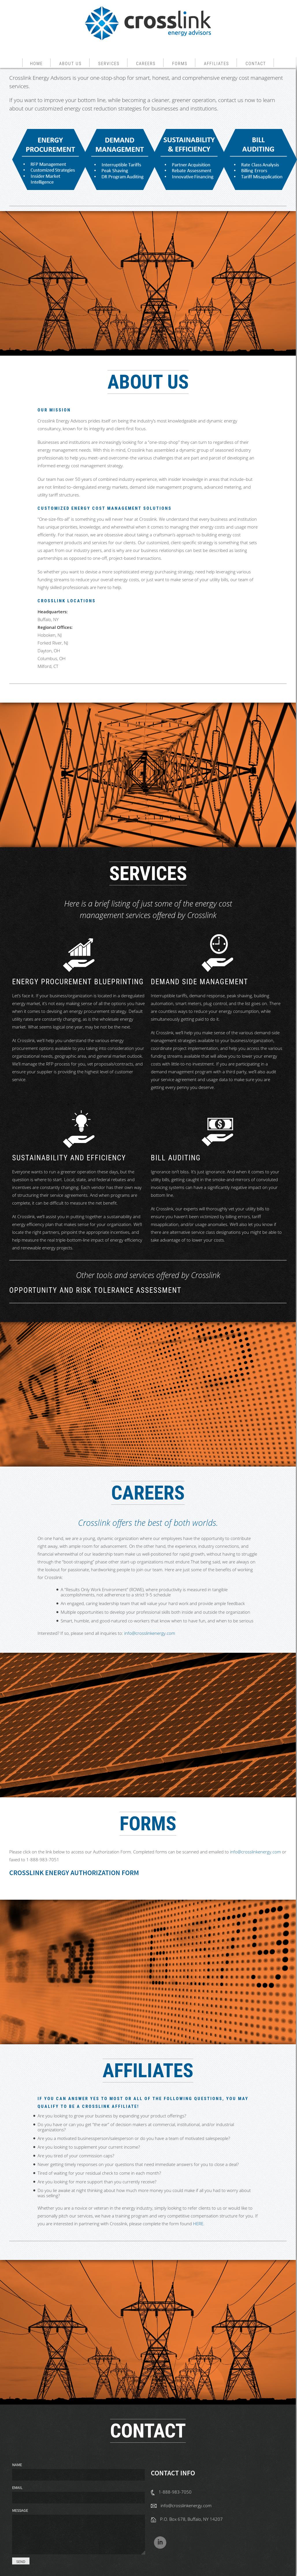 Crosslink Energy Advisors Competitors, Revenue and Employees